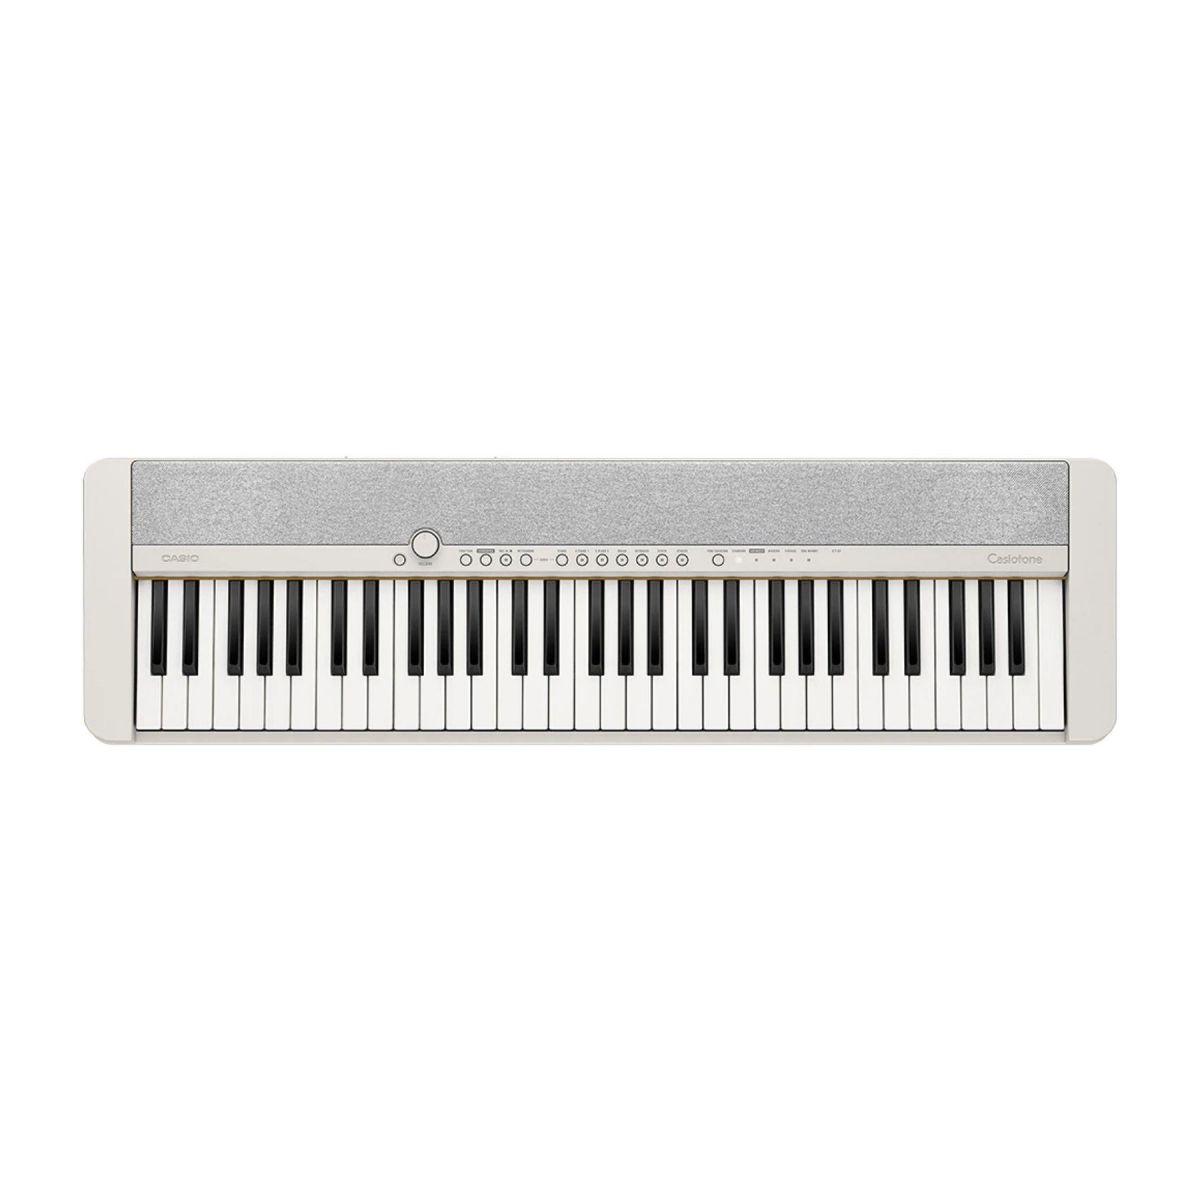 Tastiera Arranger Casio CT-S1 61 tasti white